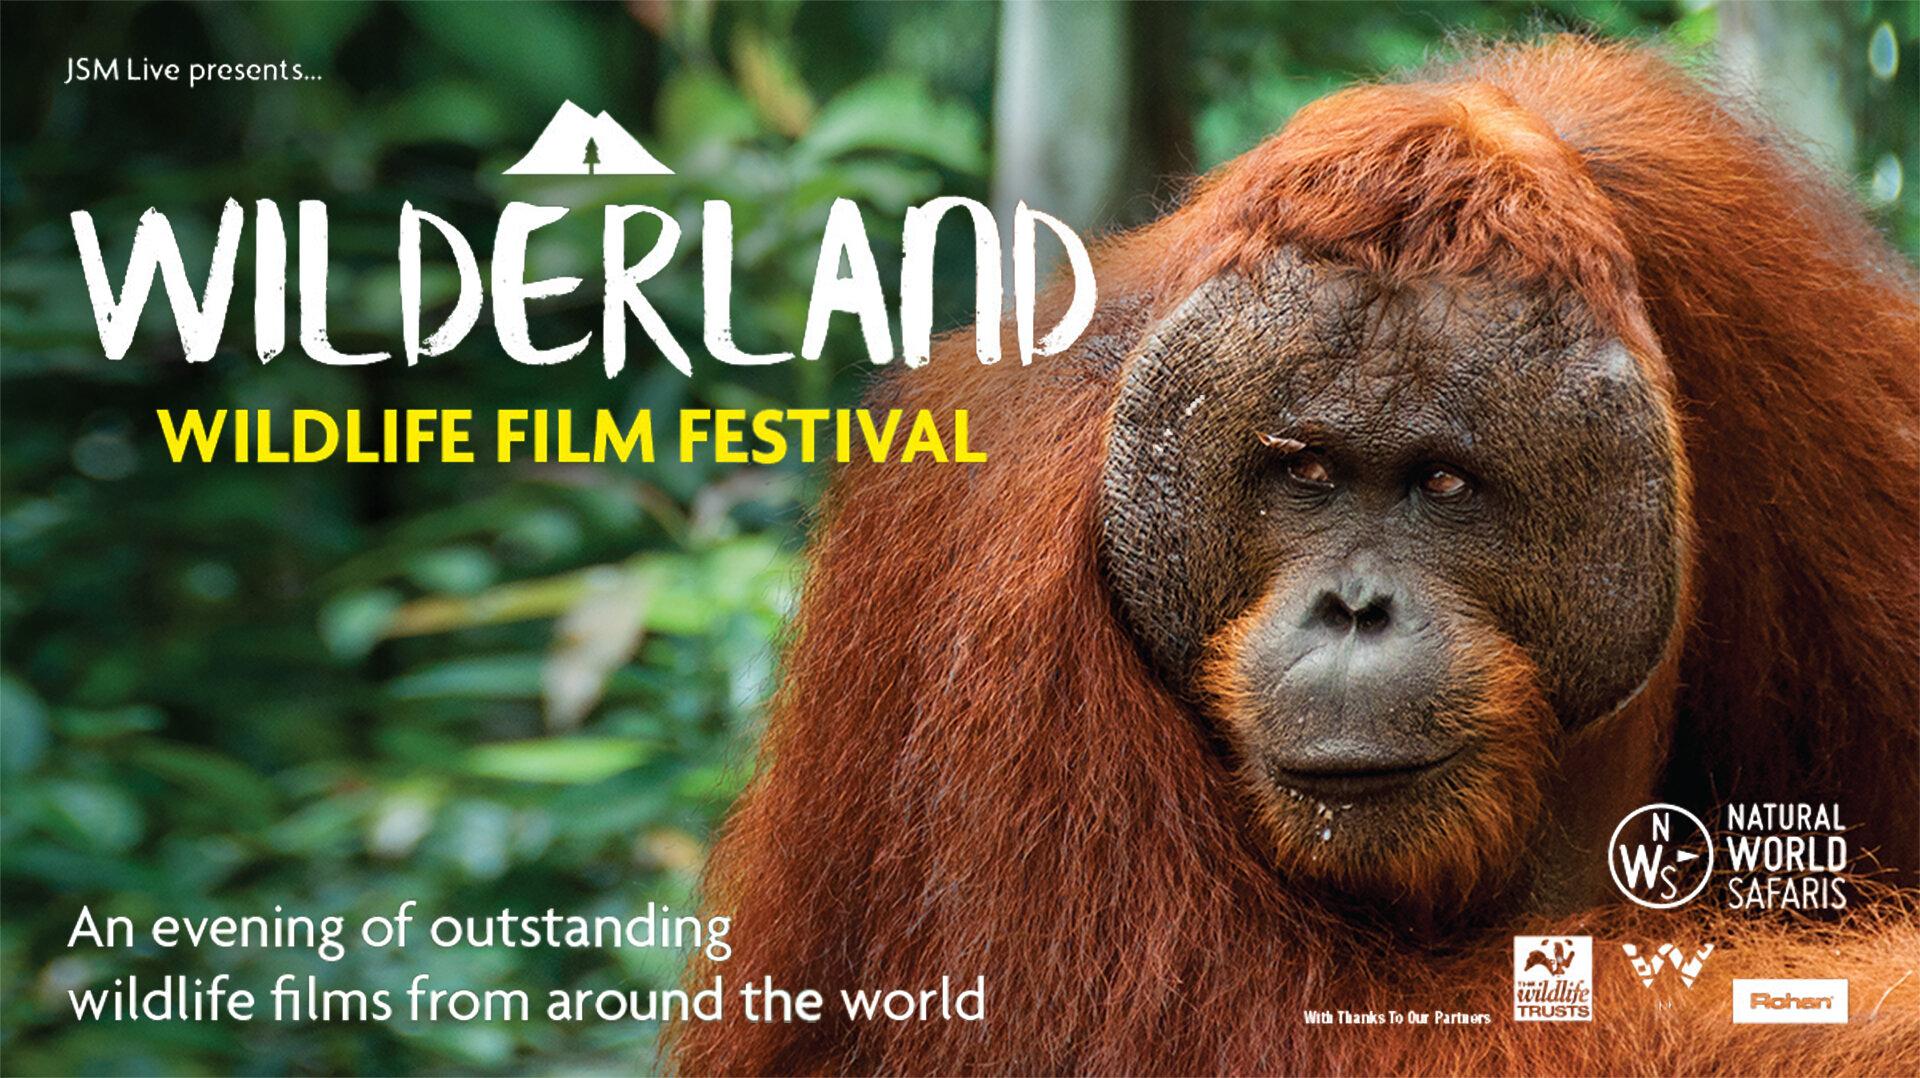 Wilderland-A3-Horz-(Orangutan)-1920x1080.jpg